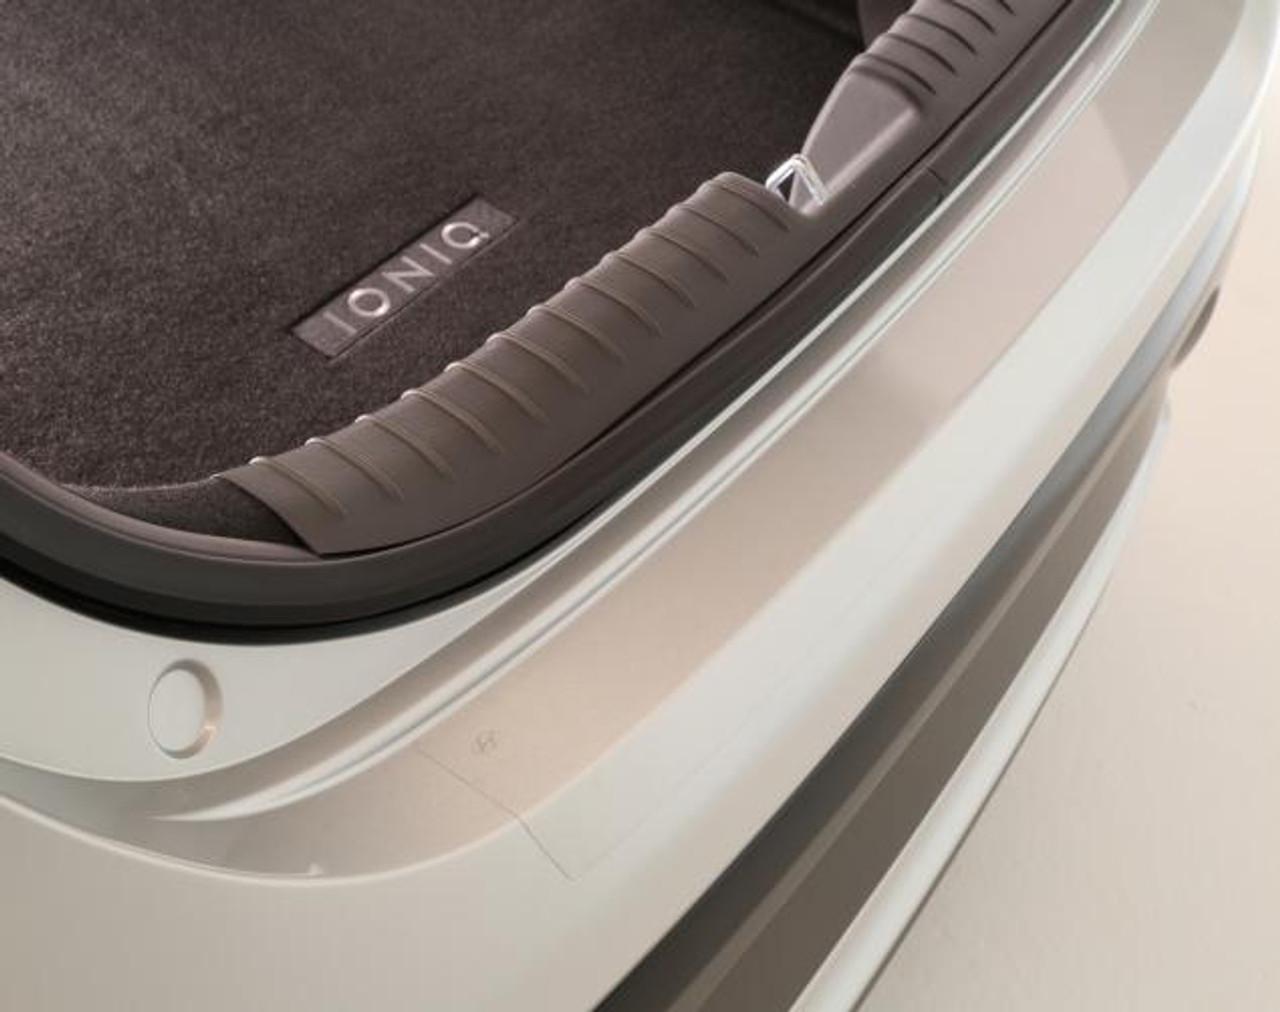 2017 2019 Hyundai Ioniq Rear Bumper Protector Film H040